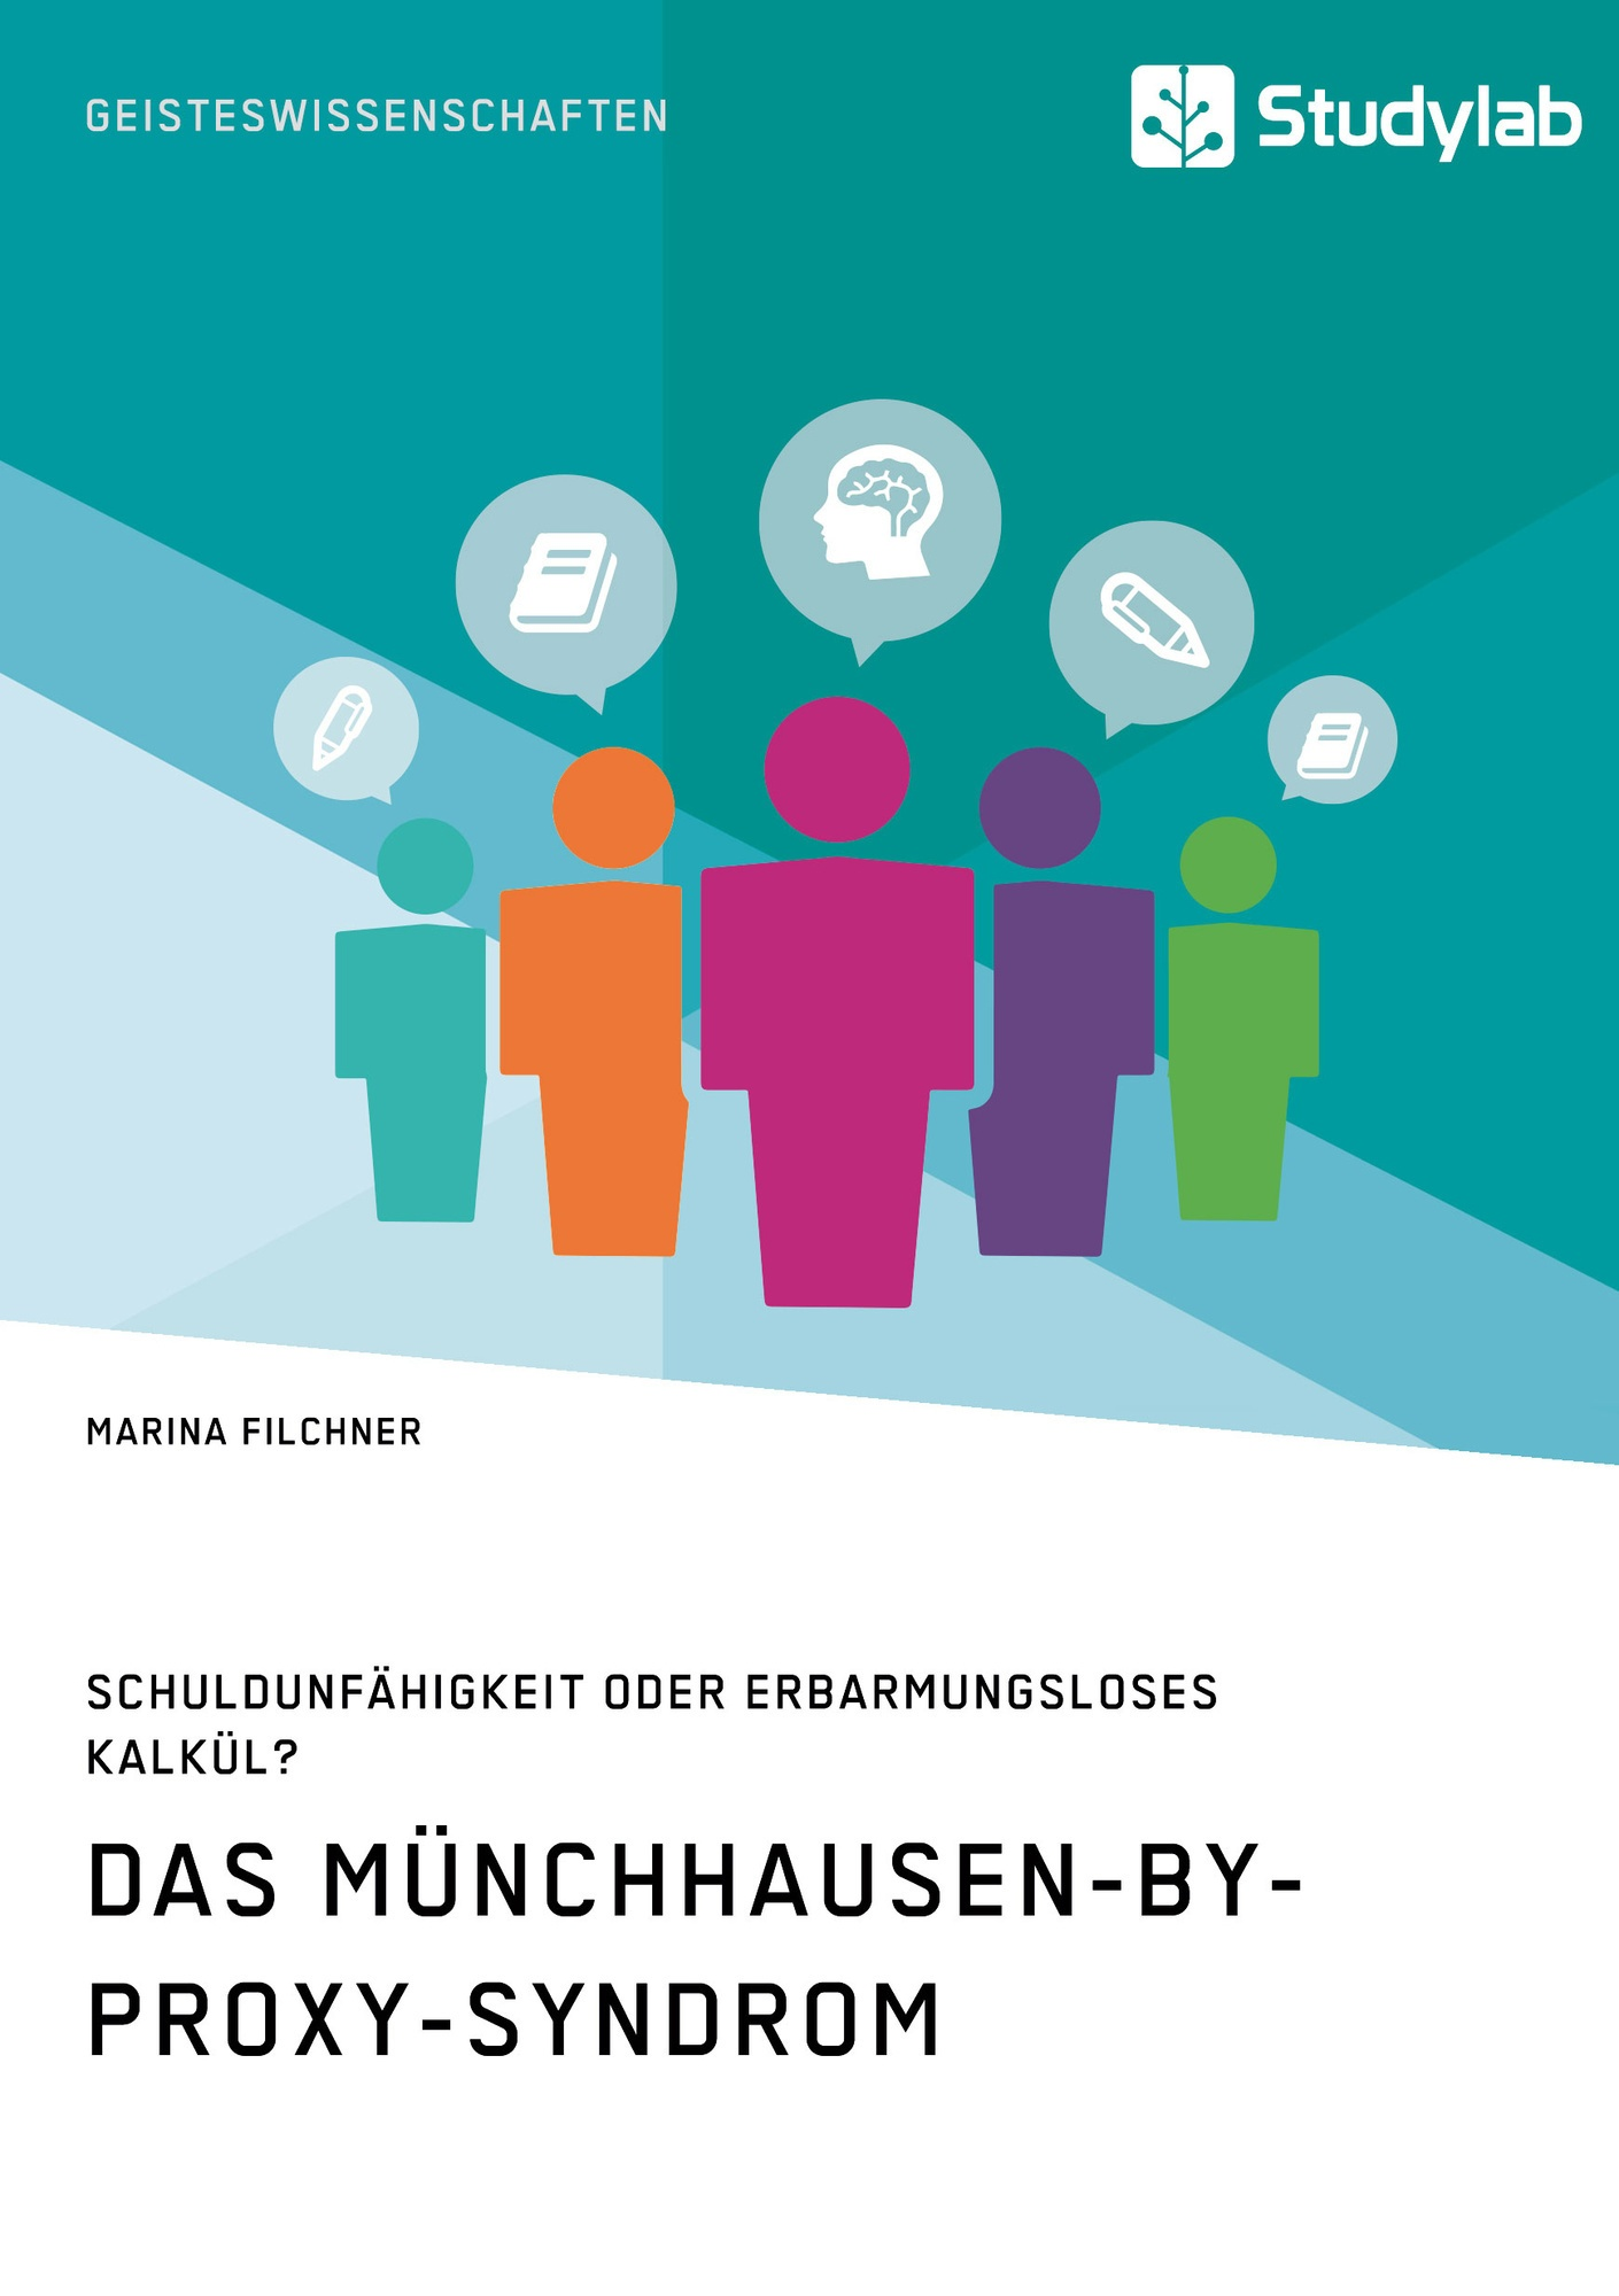 Titel: Das Münchhausen-by-proxy-Syndrom